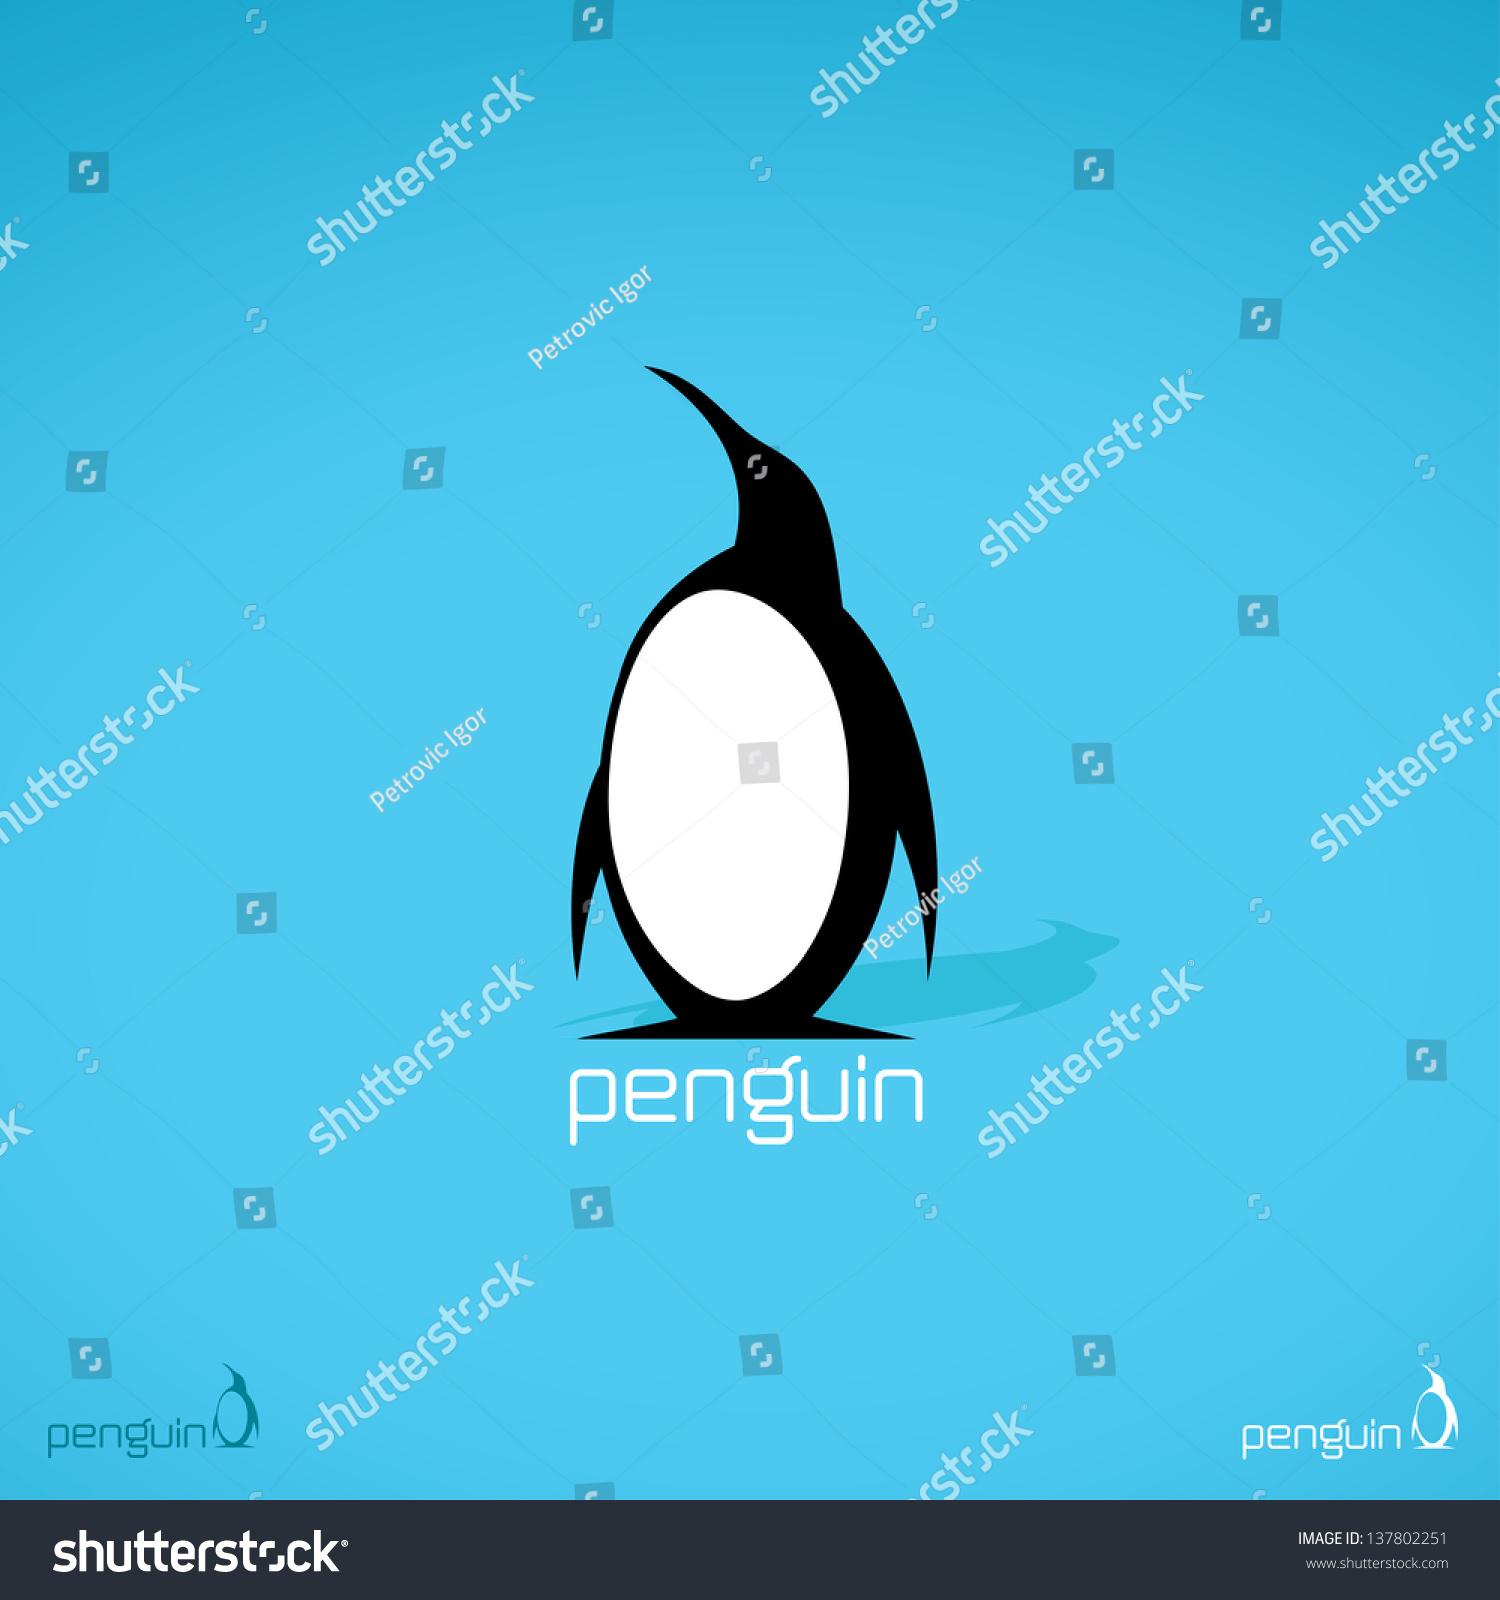 Penguin Label Vector Illustration Stock Vector